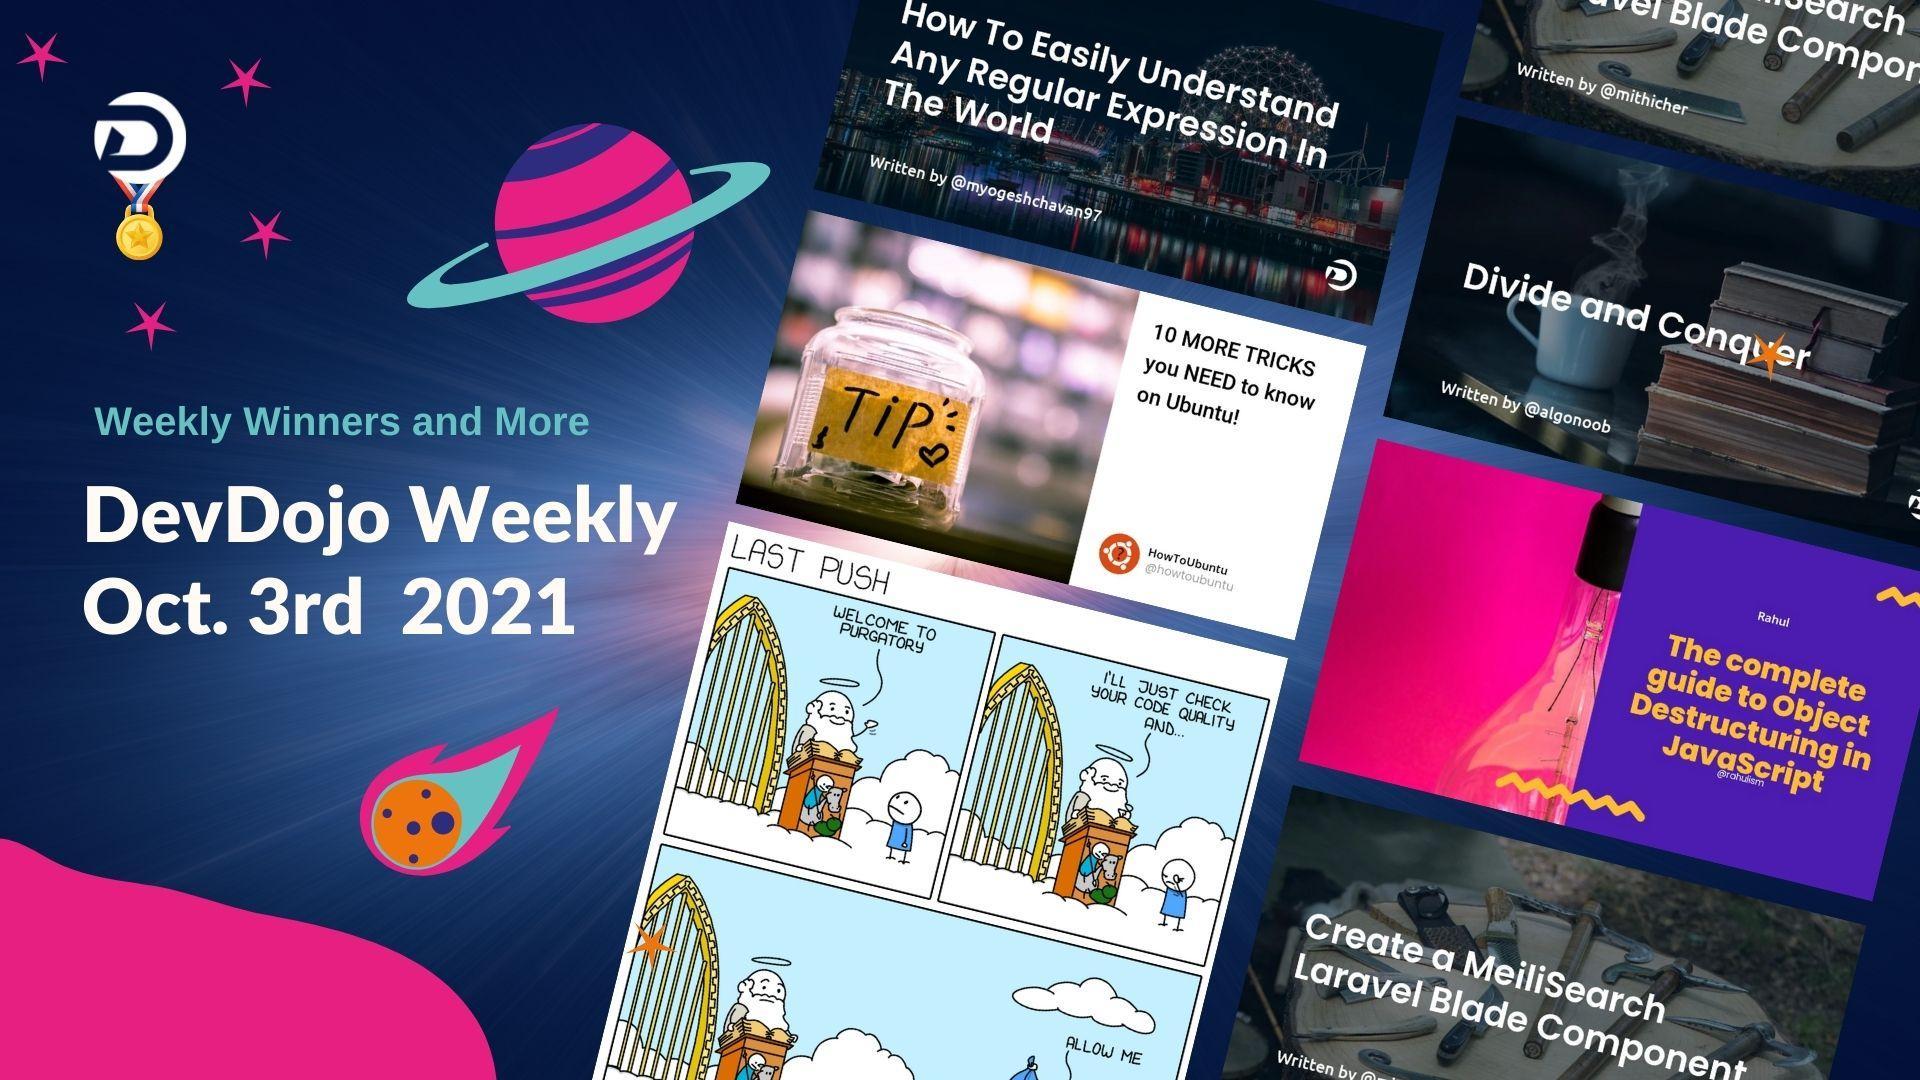 DevDojo Weekly - Oct. 3rd  2021